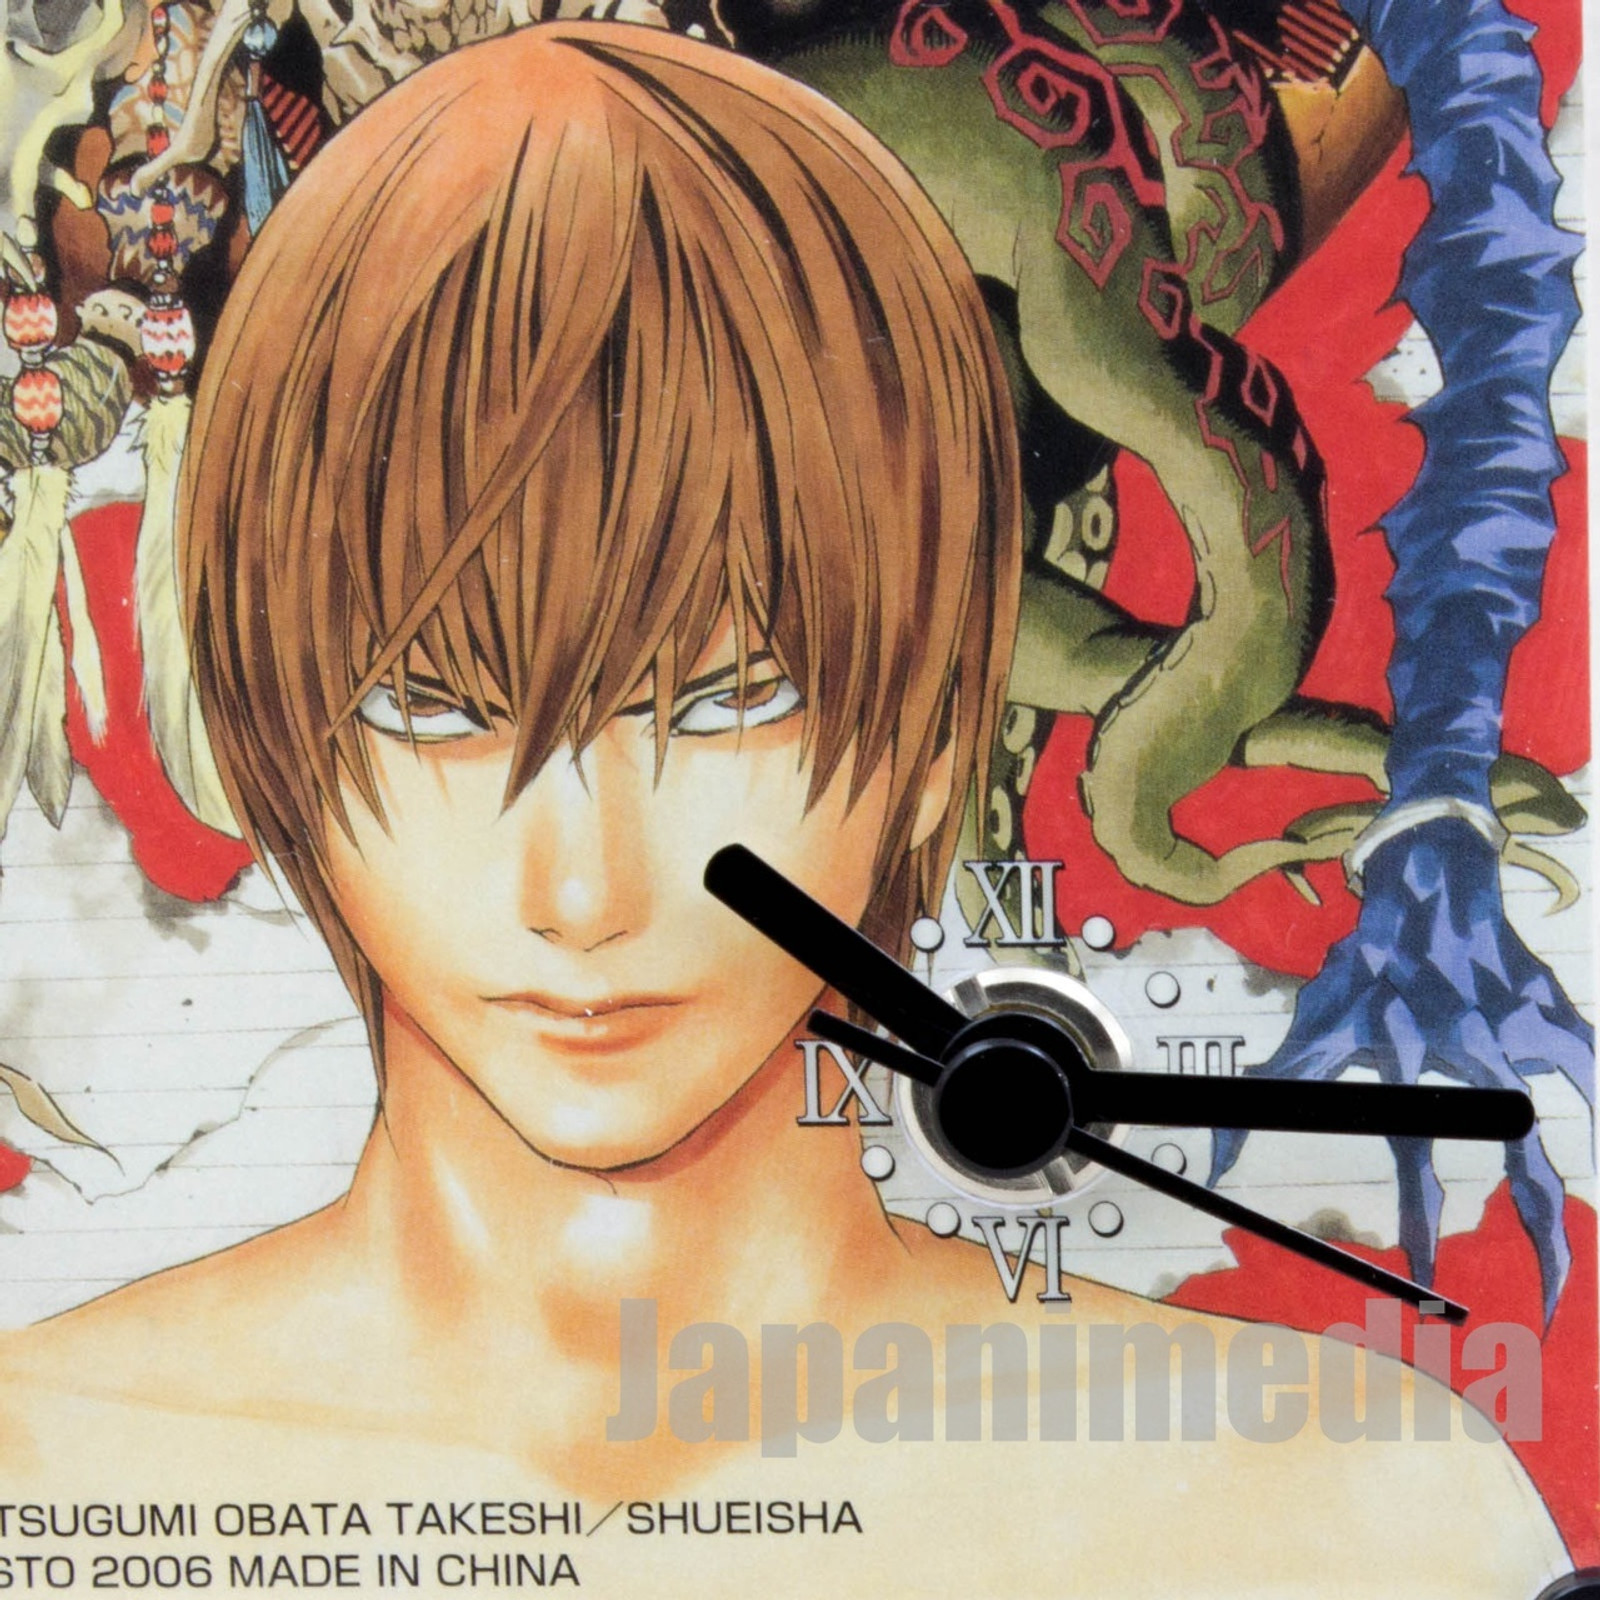 Death Note Picture Desktop Clock Yagami Light & Shinigami Banpresto JAPAN GAME